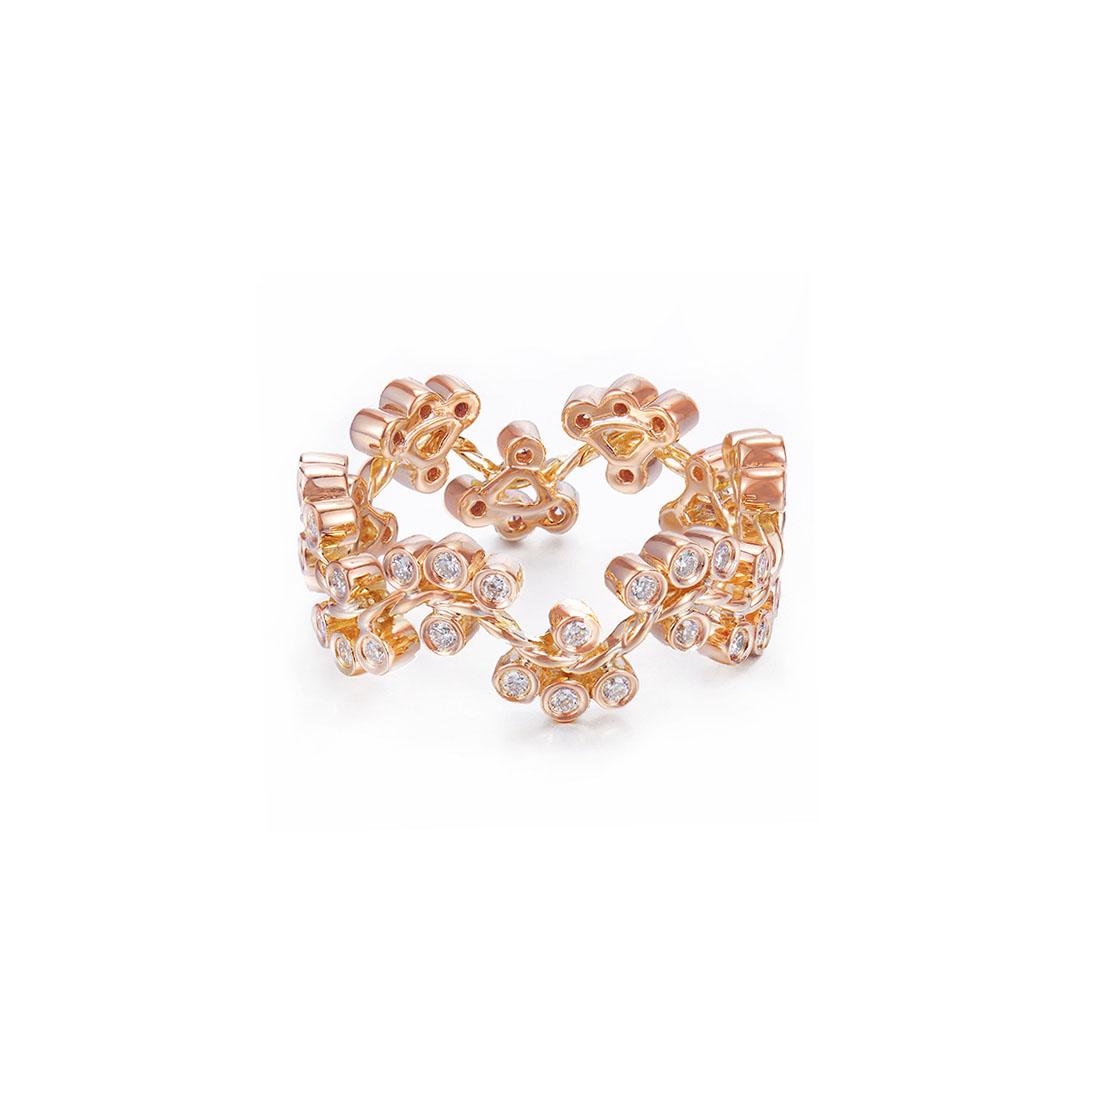 32-JeweLyrie-Signature-Wavy-Twist-Alternate-Diamond-Cluster-Gold-Ring-18k-14k